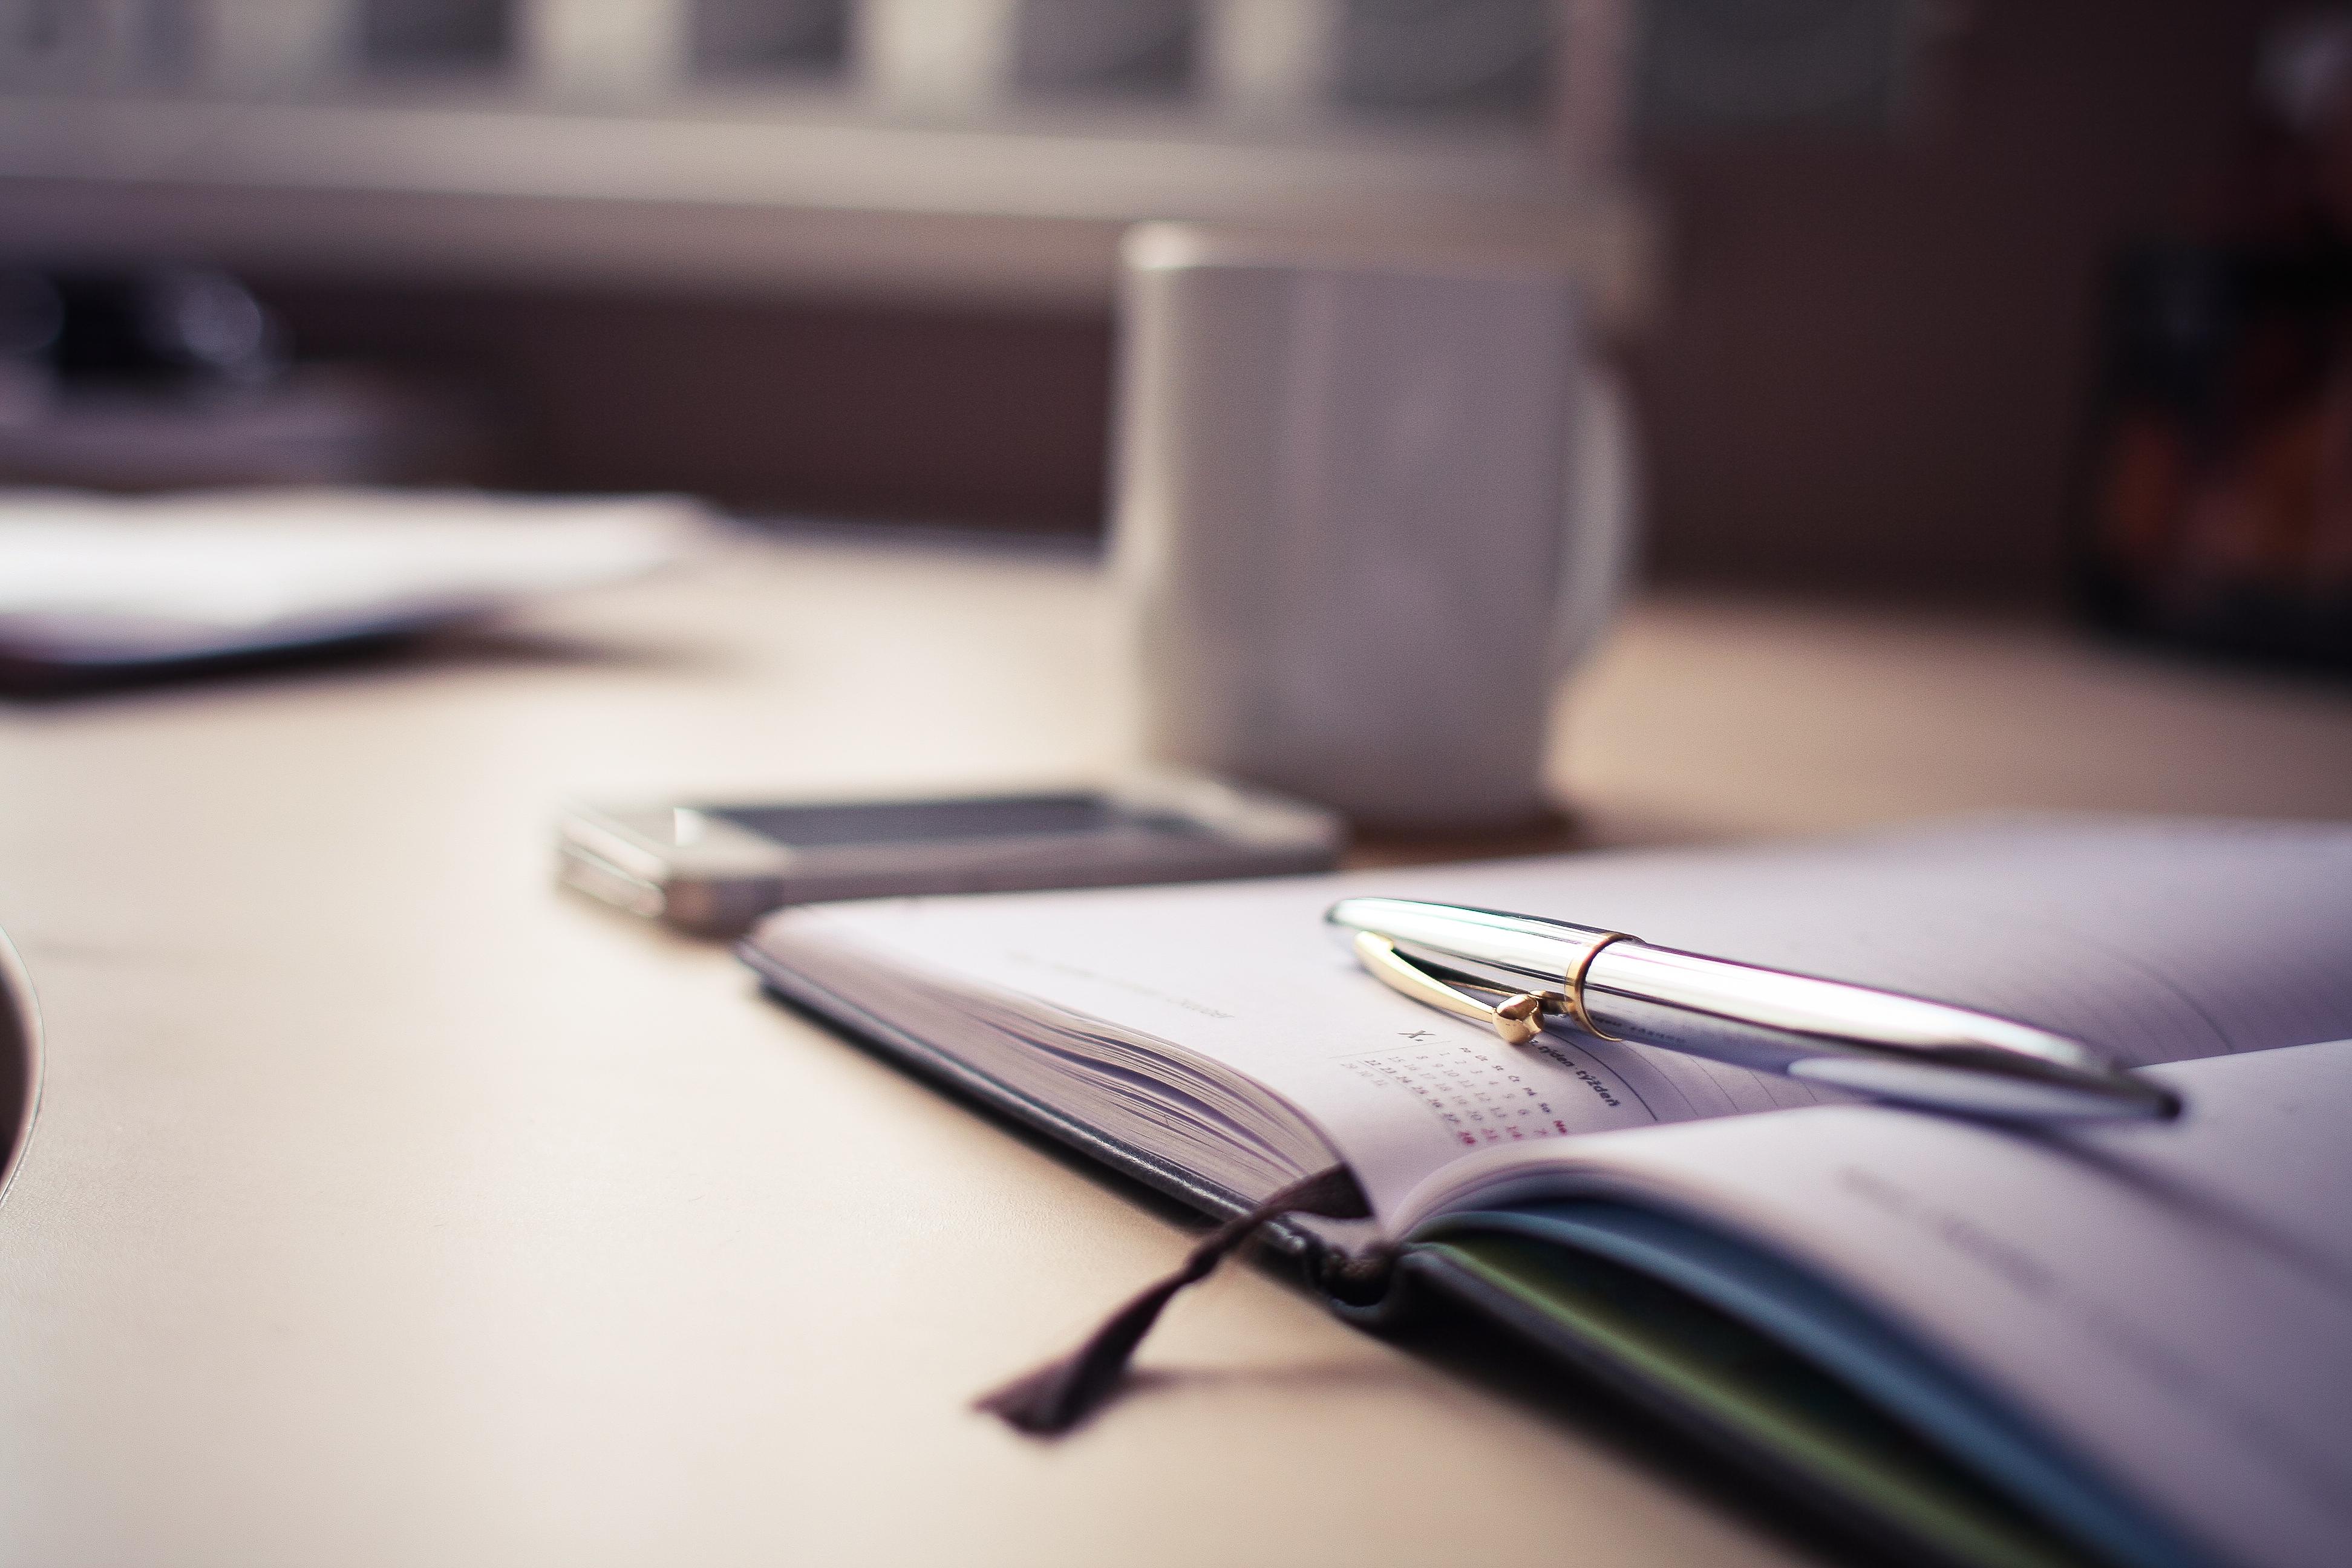 картинки на рабочий стол ручки ногти